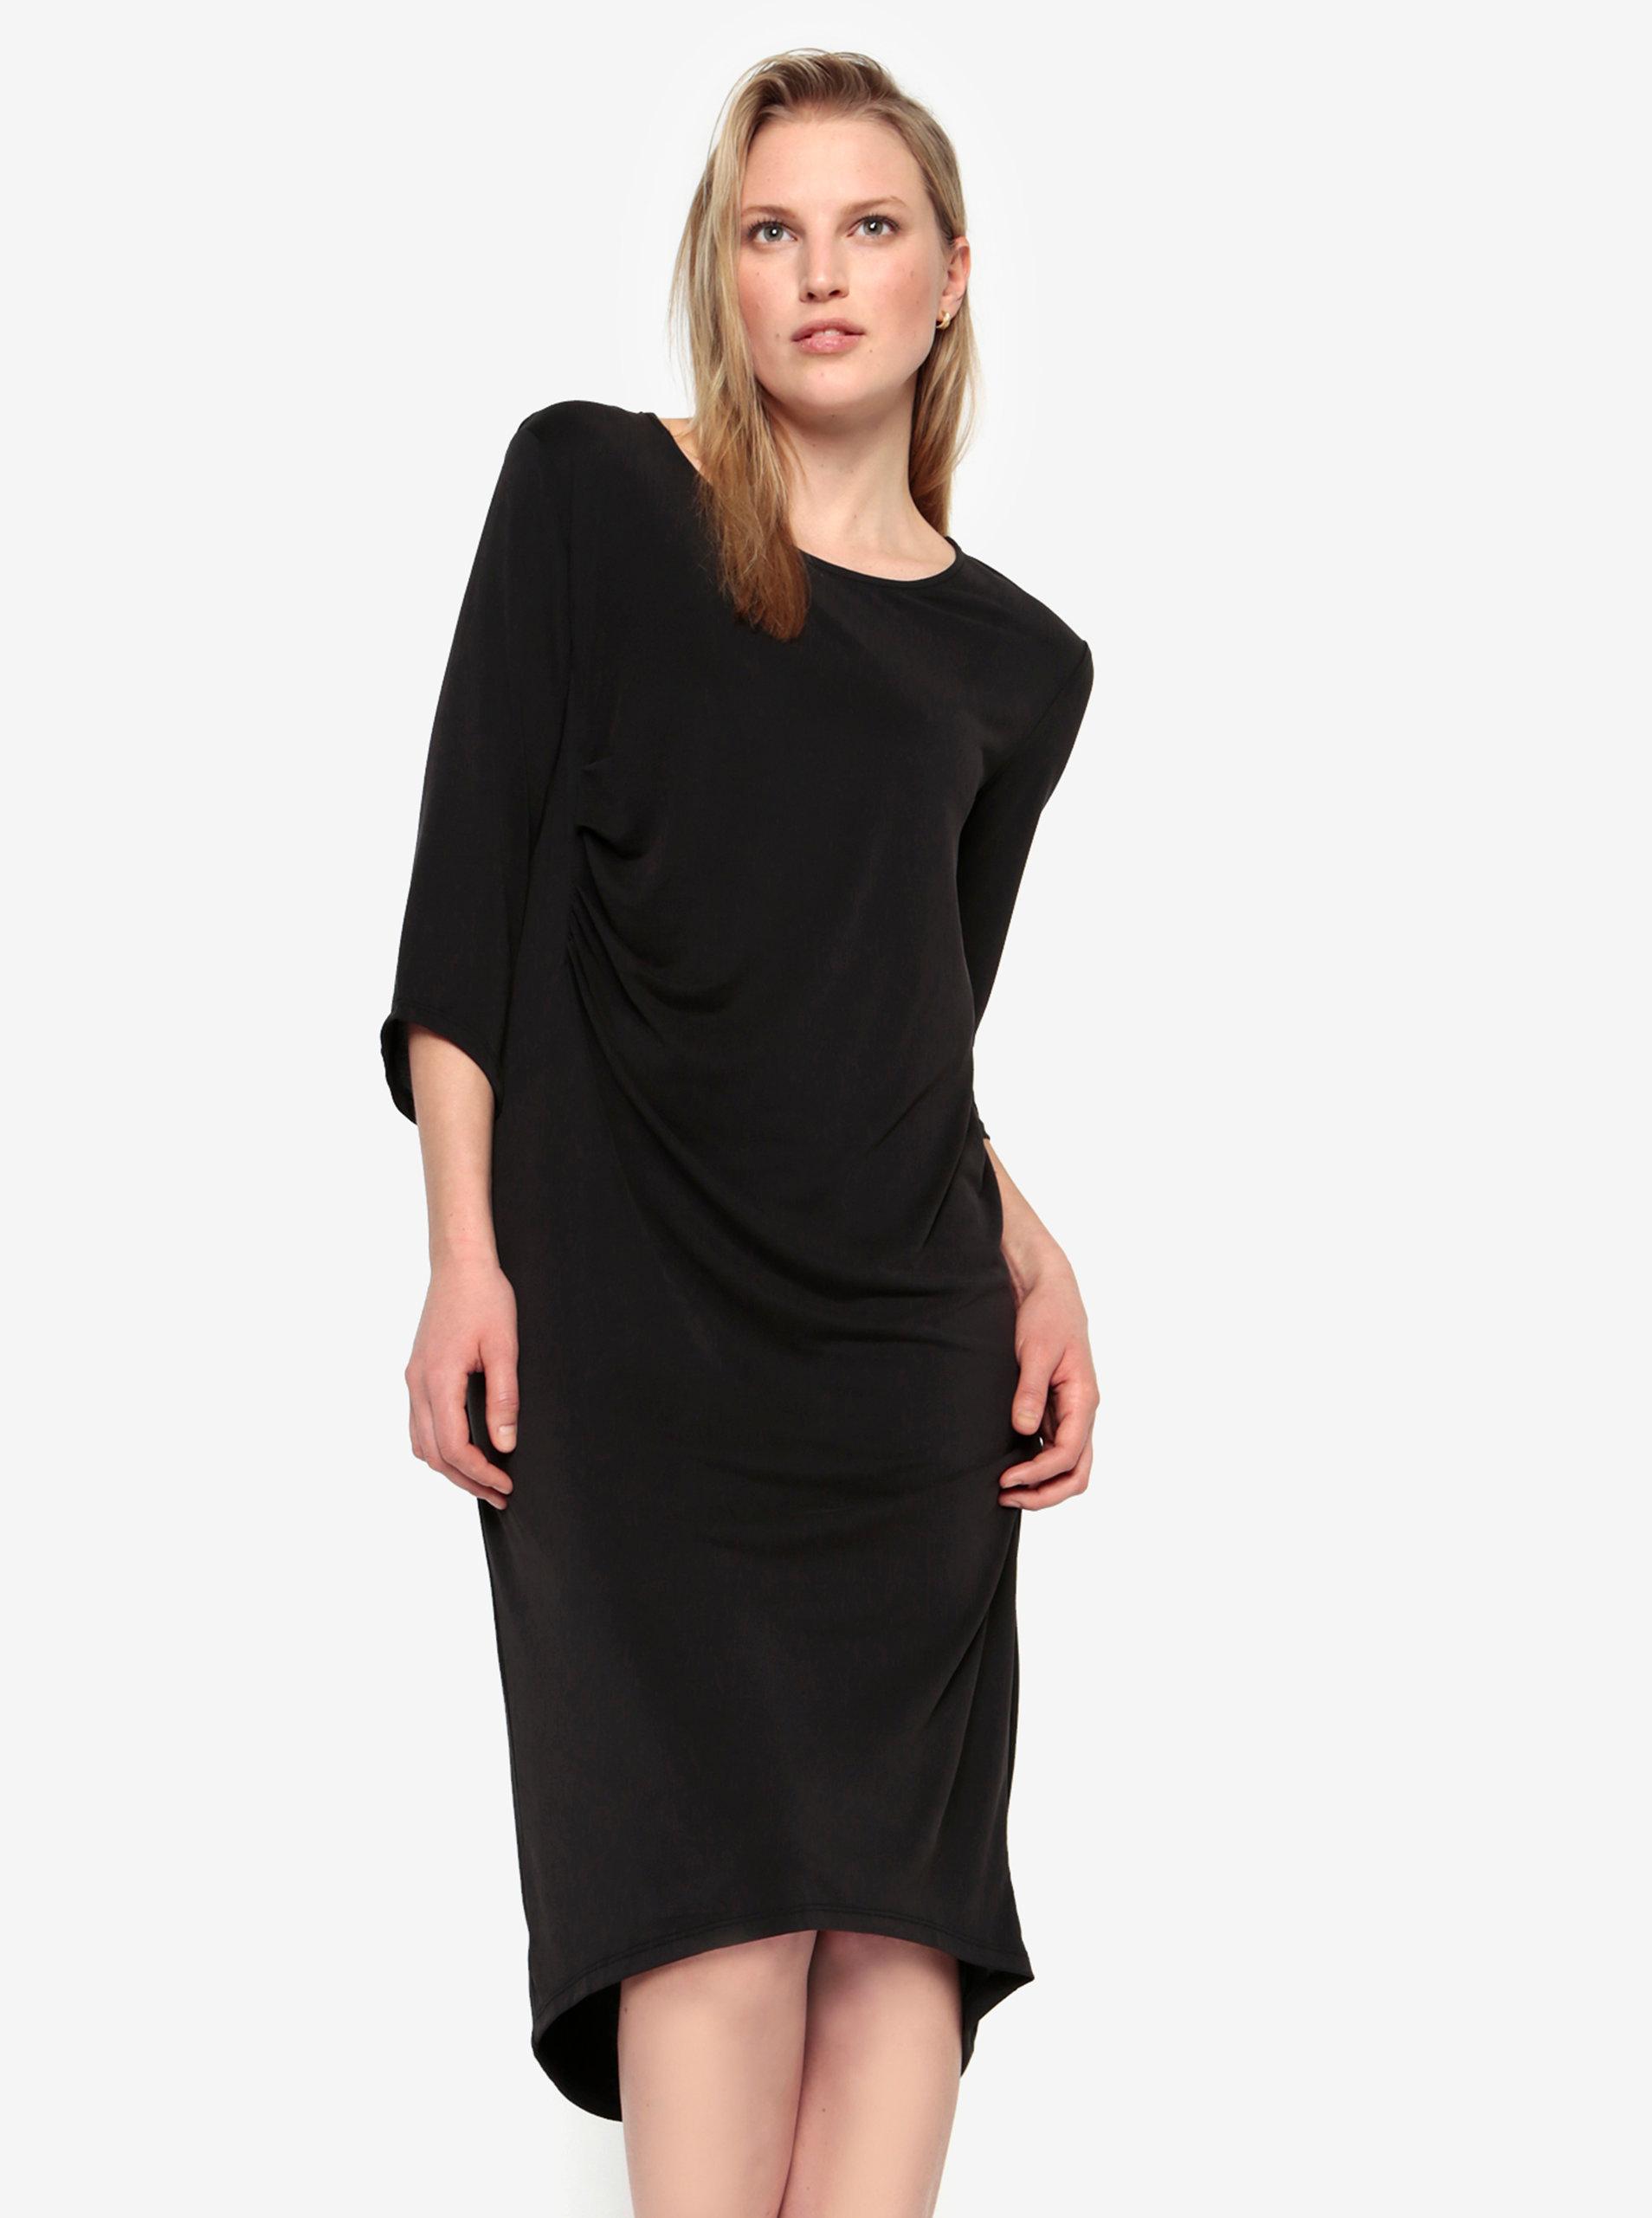 ca16c2264aea Černé volné šaty s řasením na boku Selected Femme Nola ...